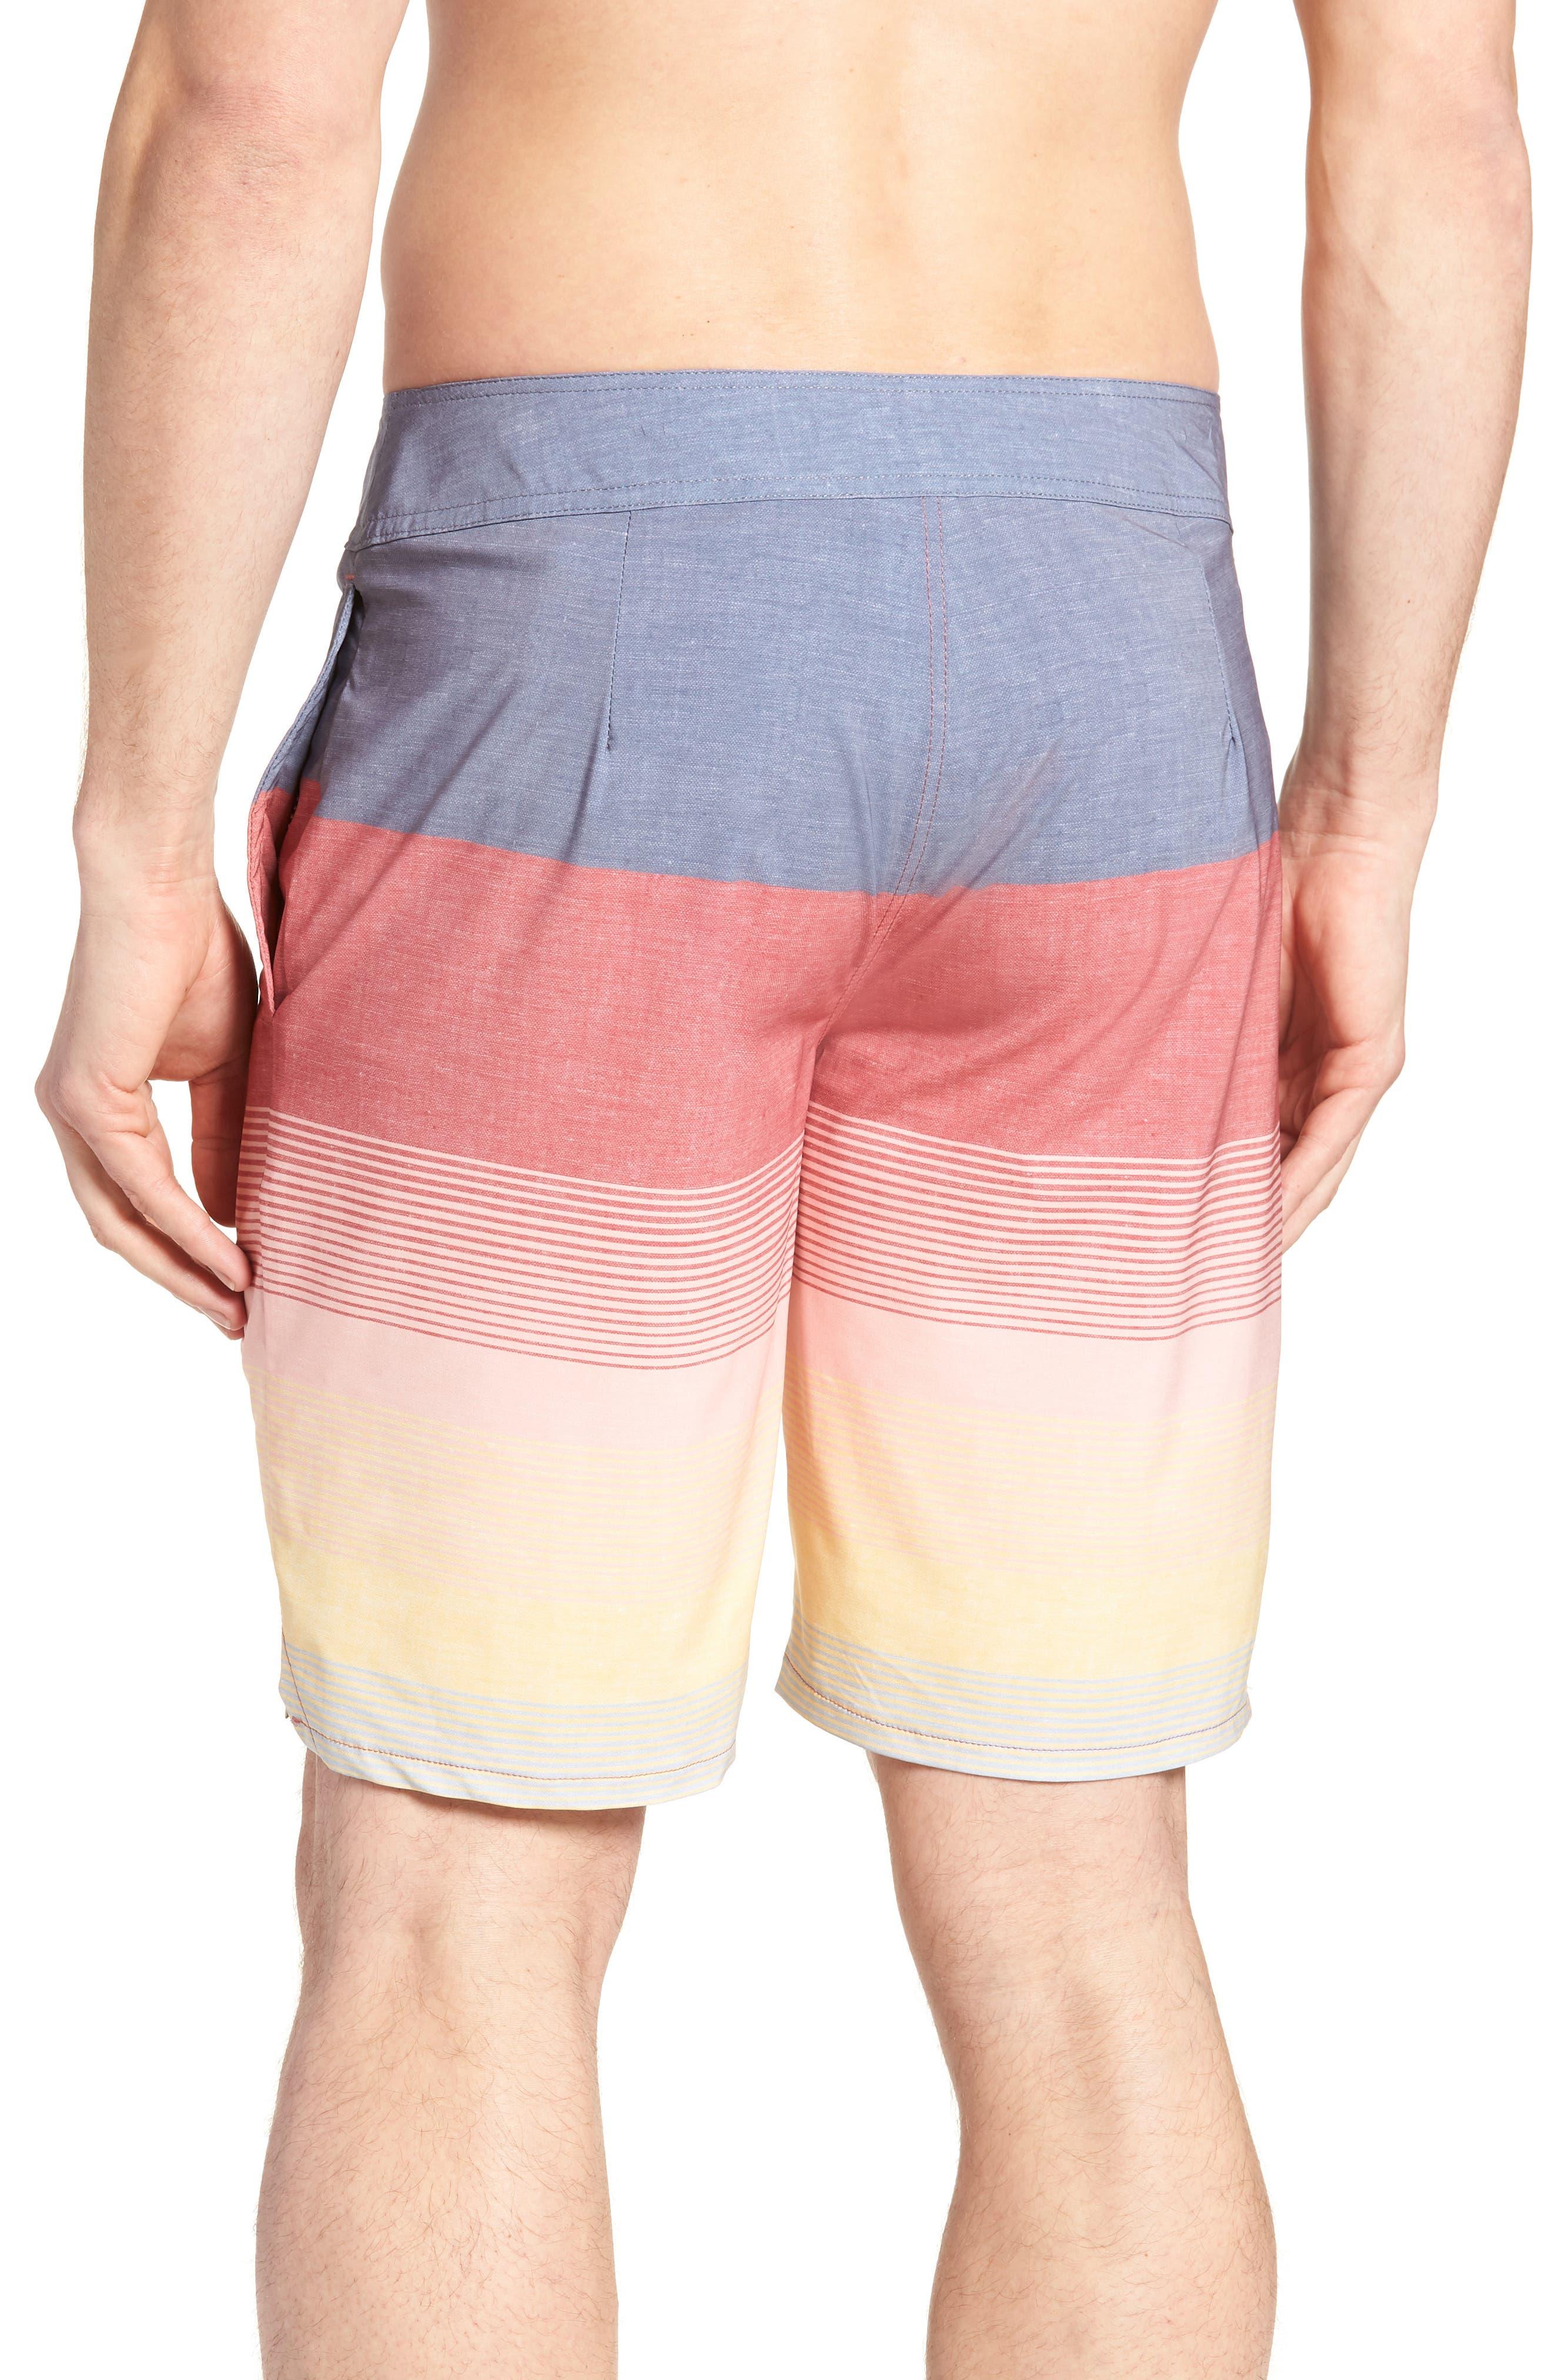 Seegrid Regular Fit Board Shorts,                             Alternate thumbnail 4, color,